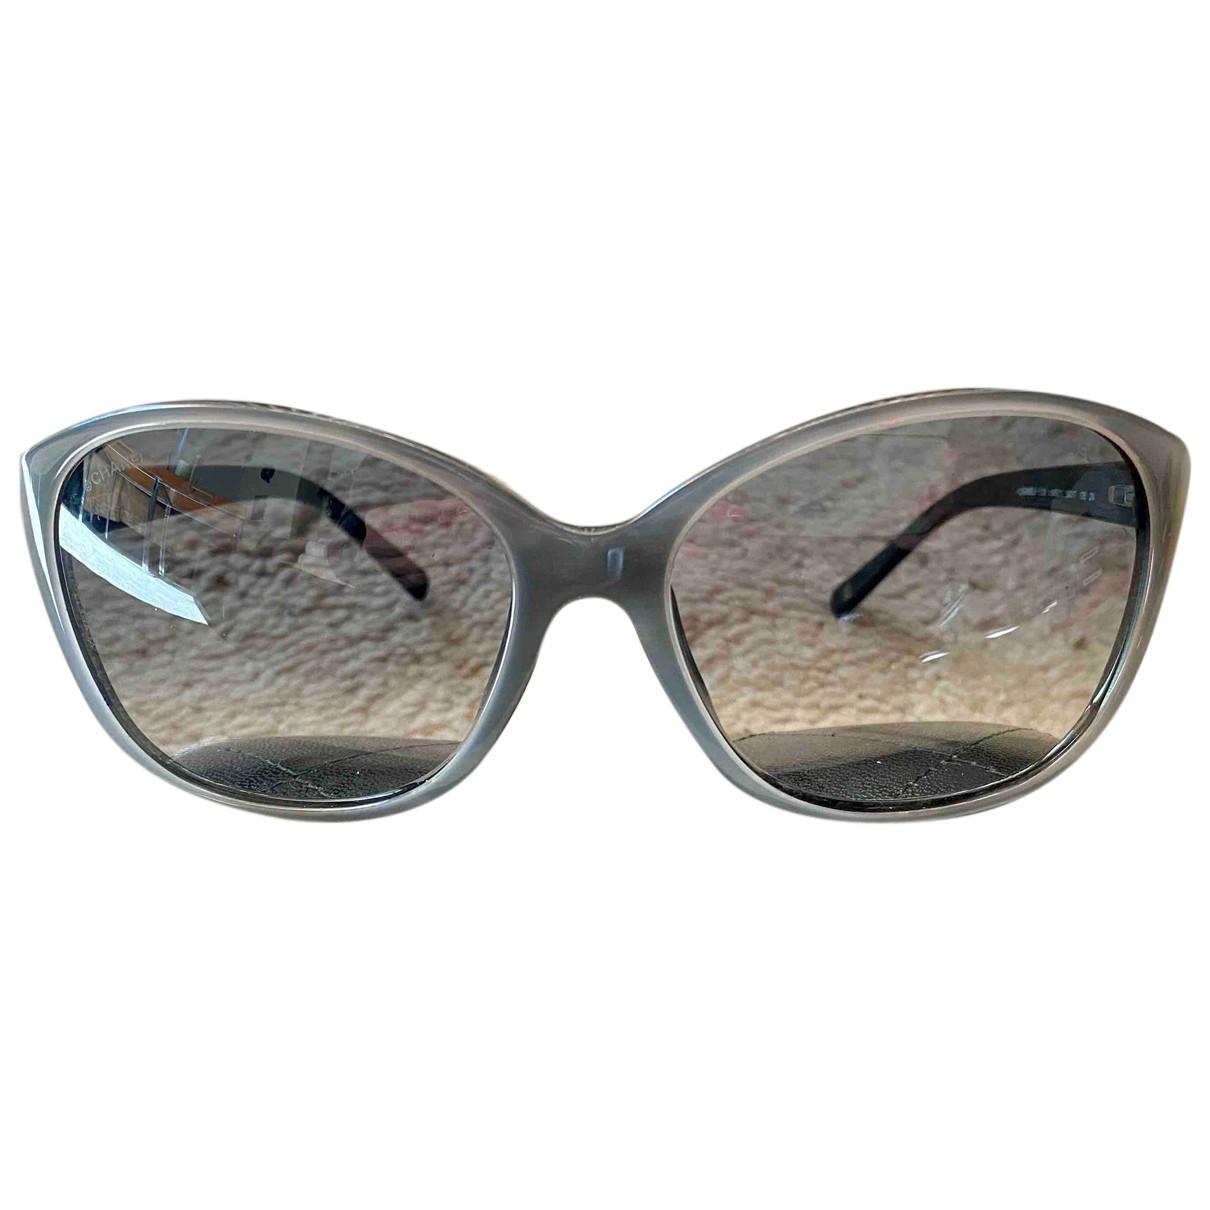 Chanel N Grey Sunglasses for Women N